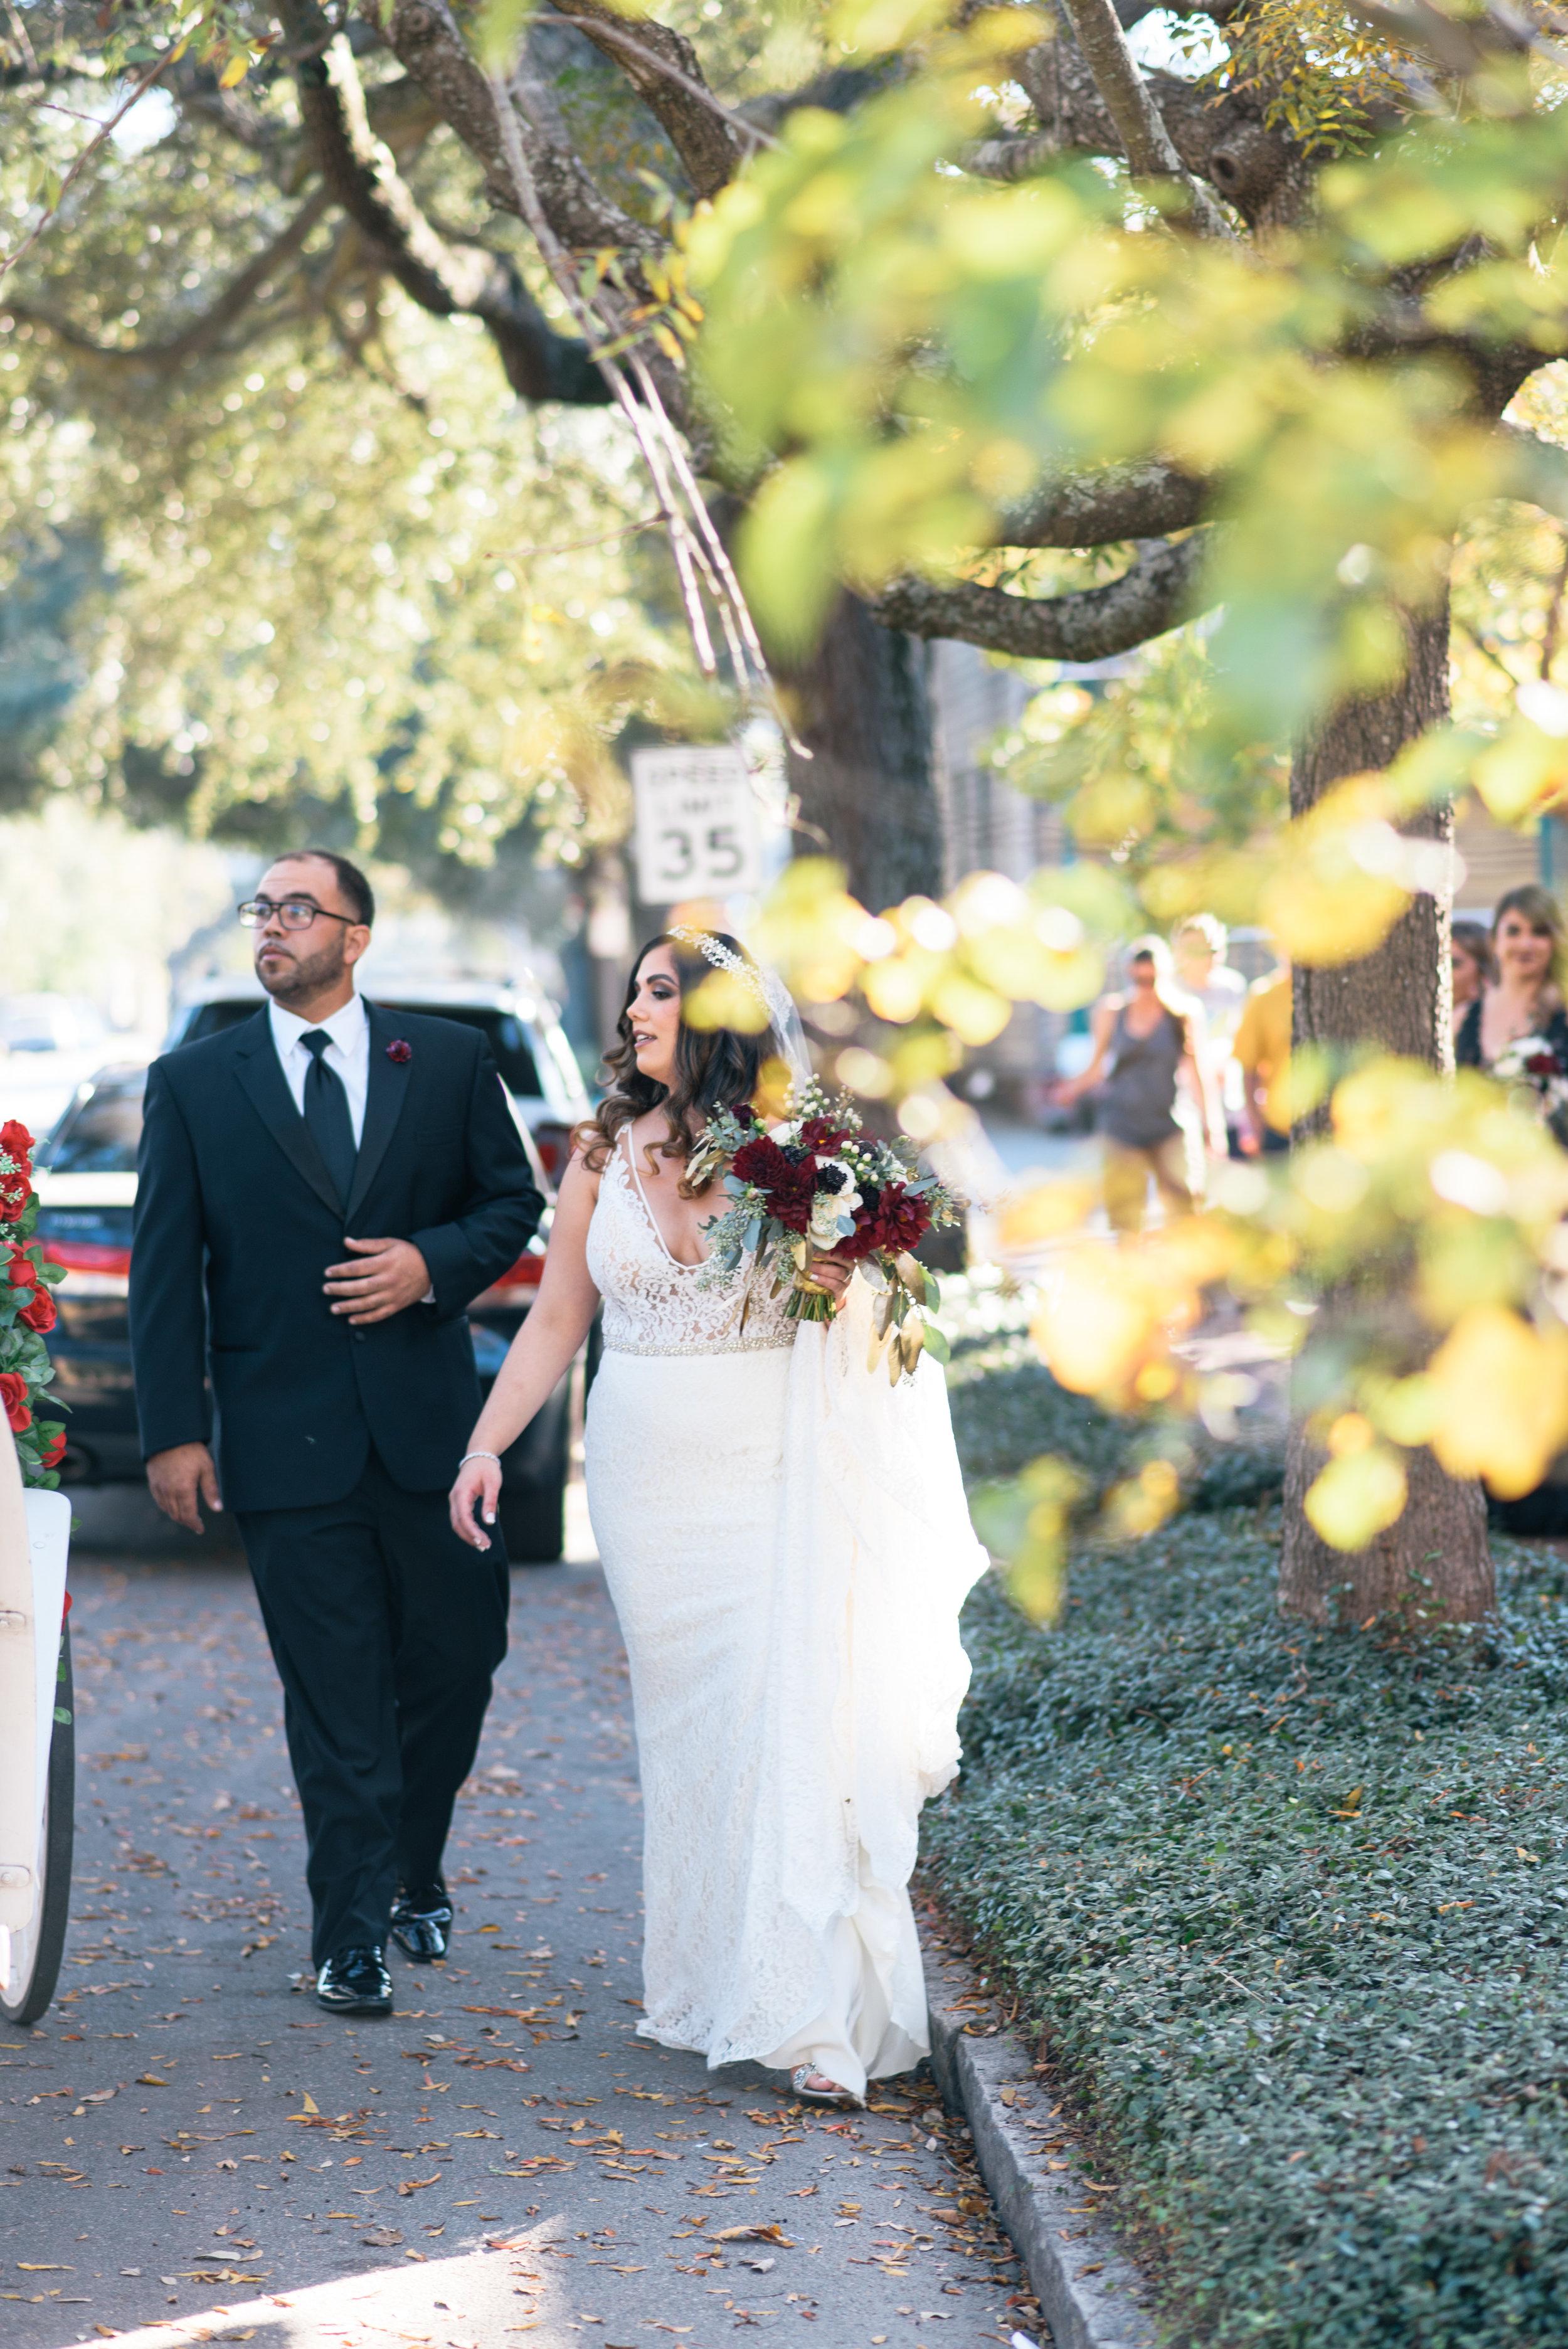 Iggy-and-yesenia-savannah-railroad-museum-wedding-meg-hill-photo- (310 of 1037).jpg